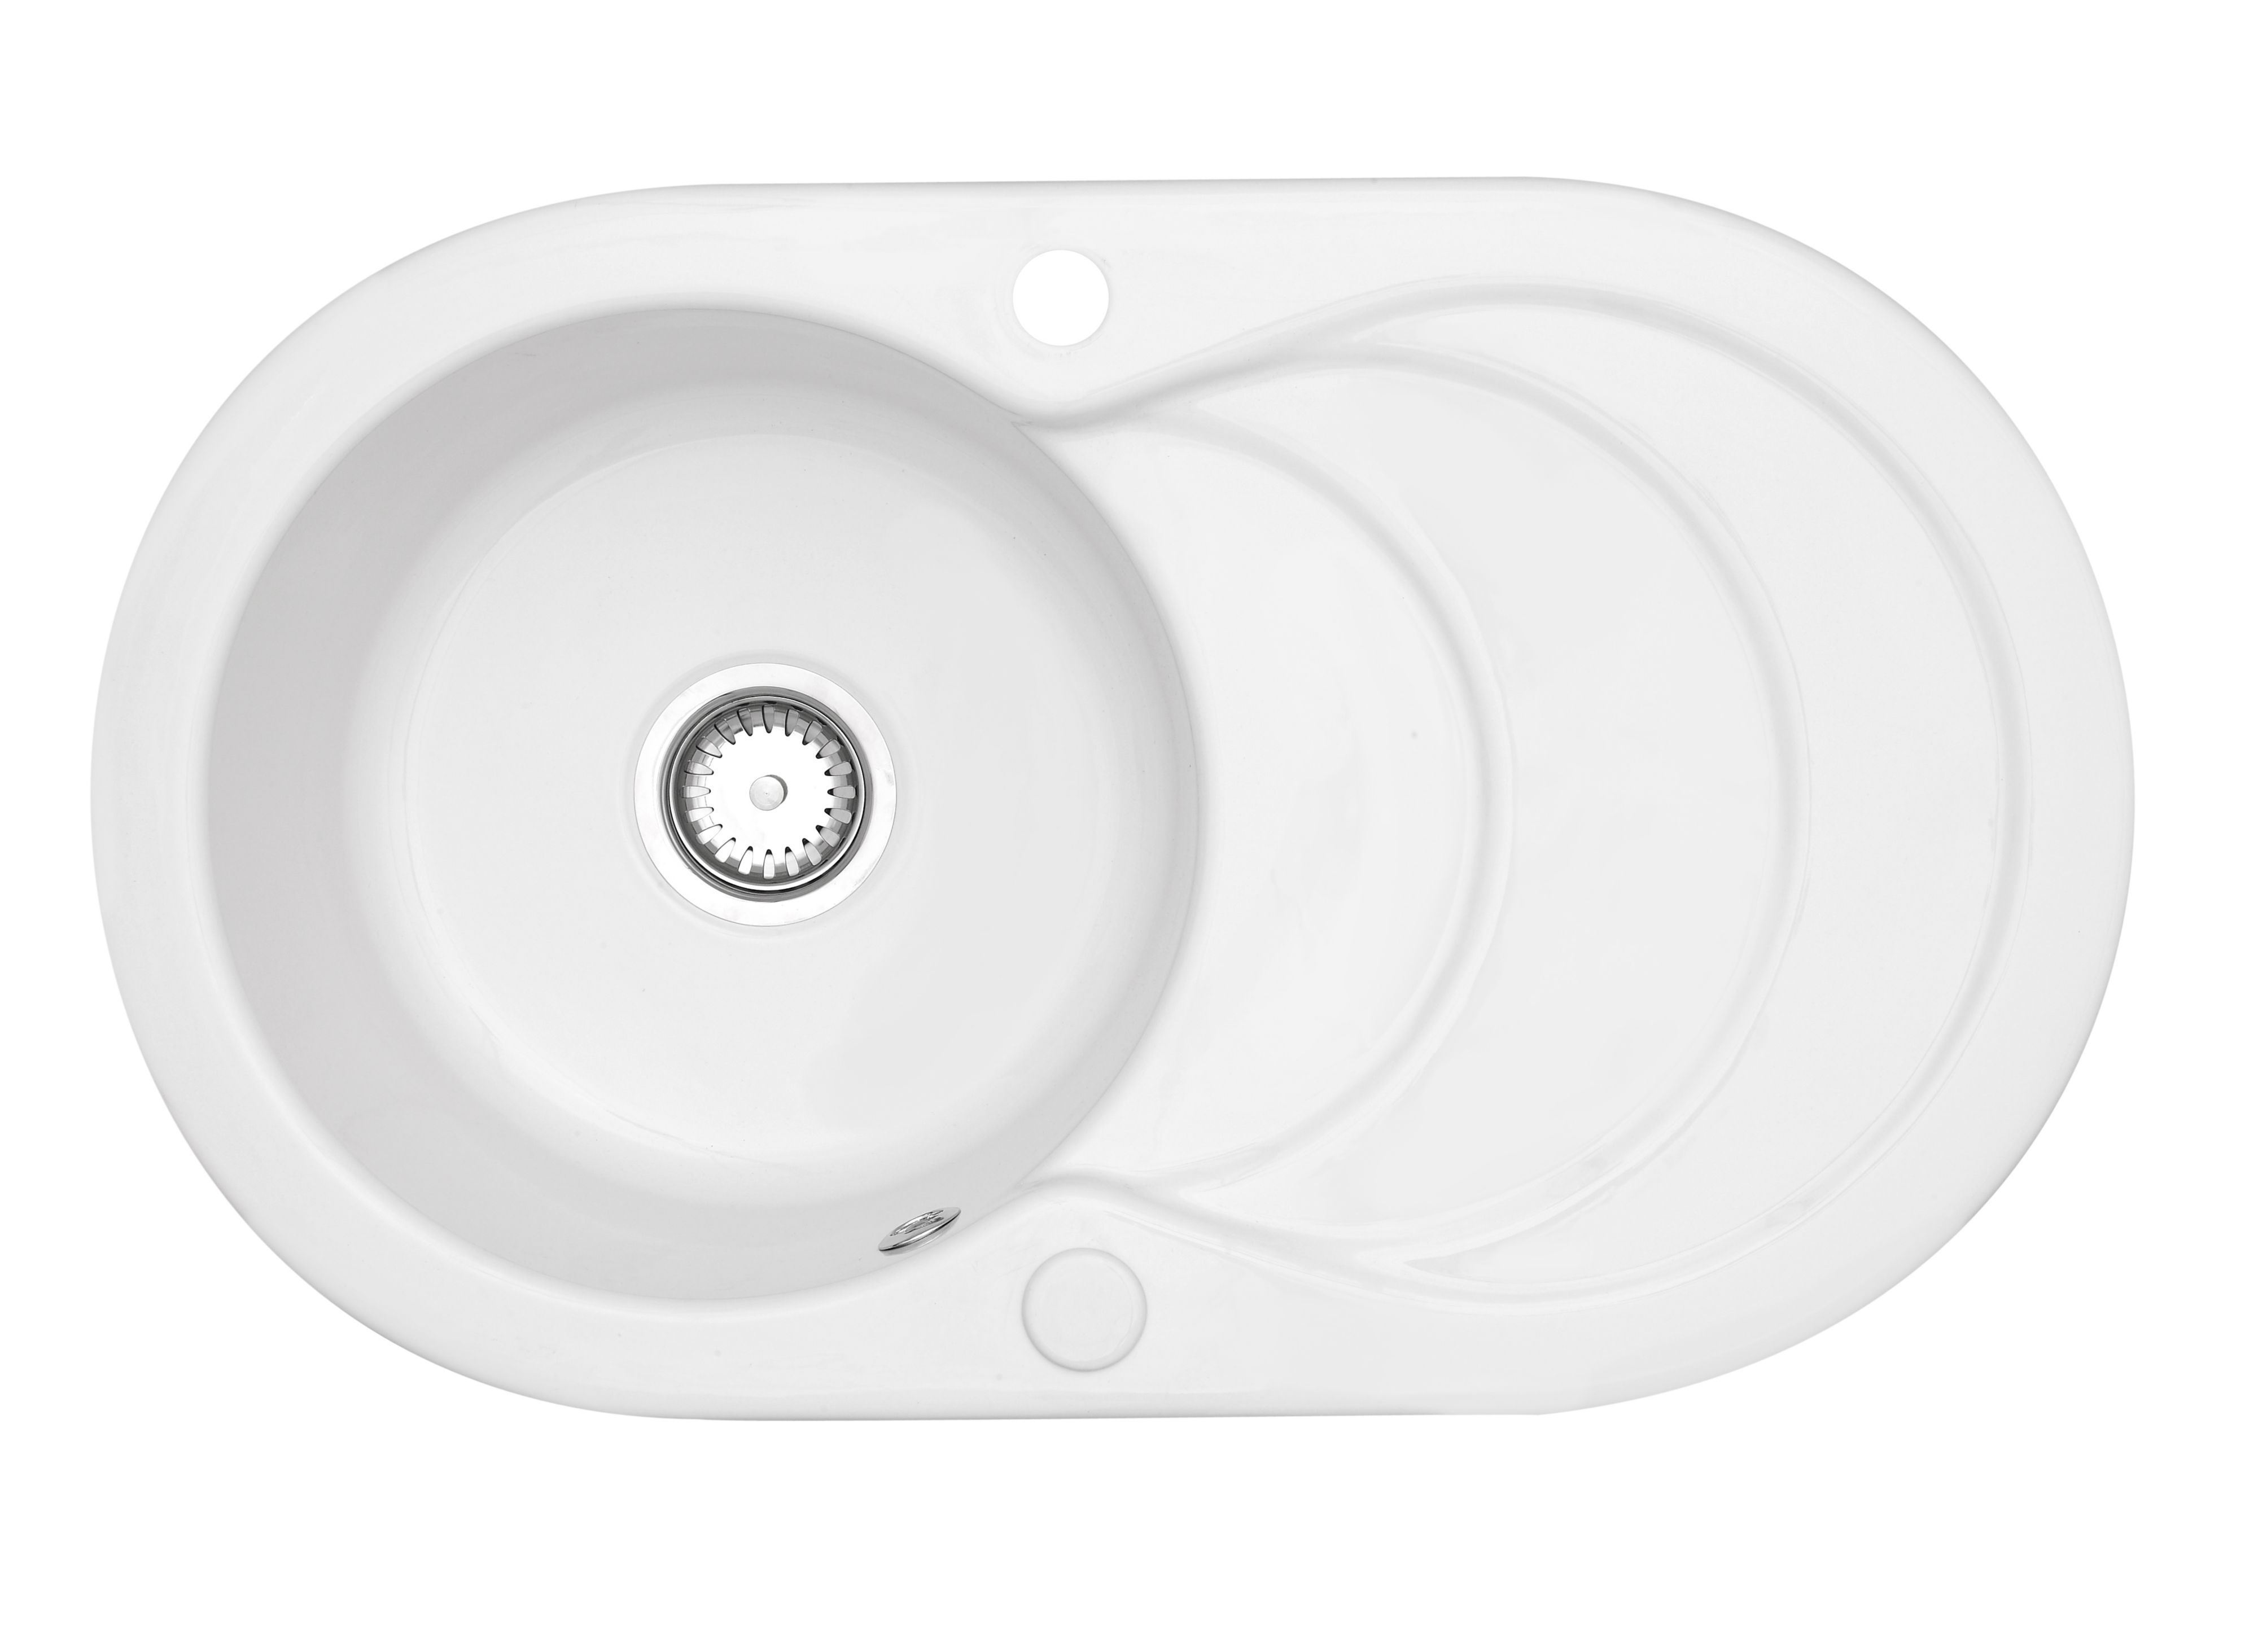 Bathroom Sinks B&Q Ireland astracast cascade 1 bowl white gloss ceramic sink & drainer